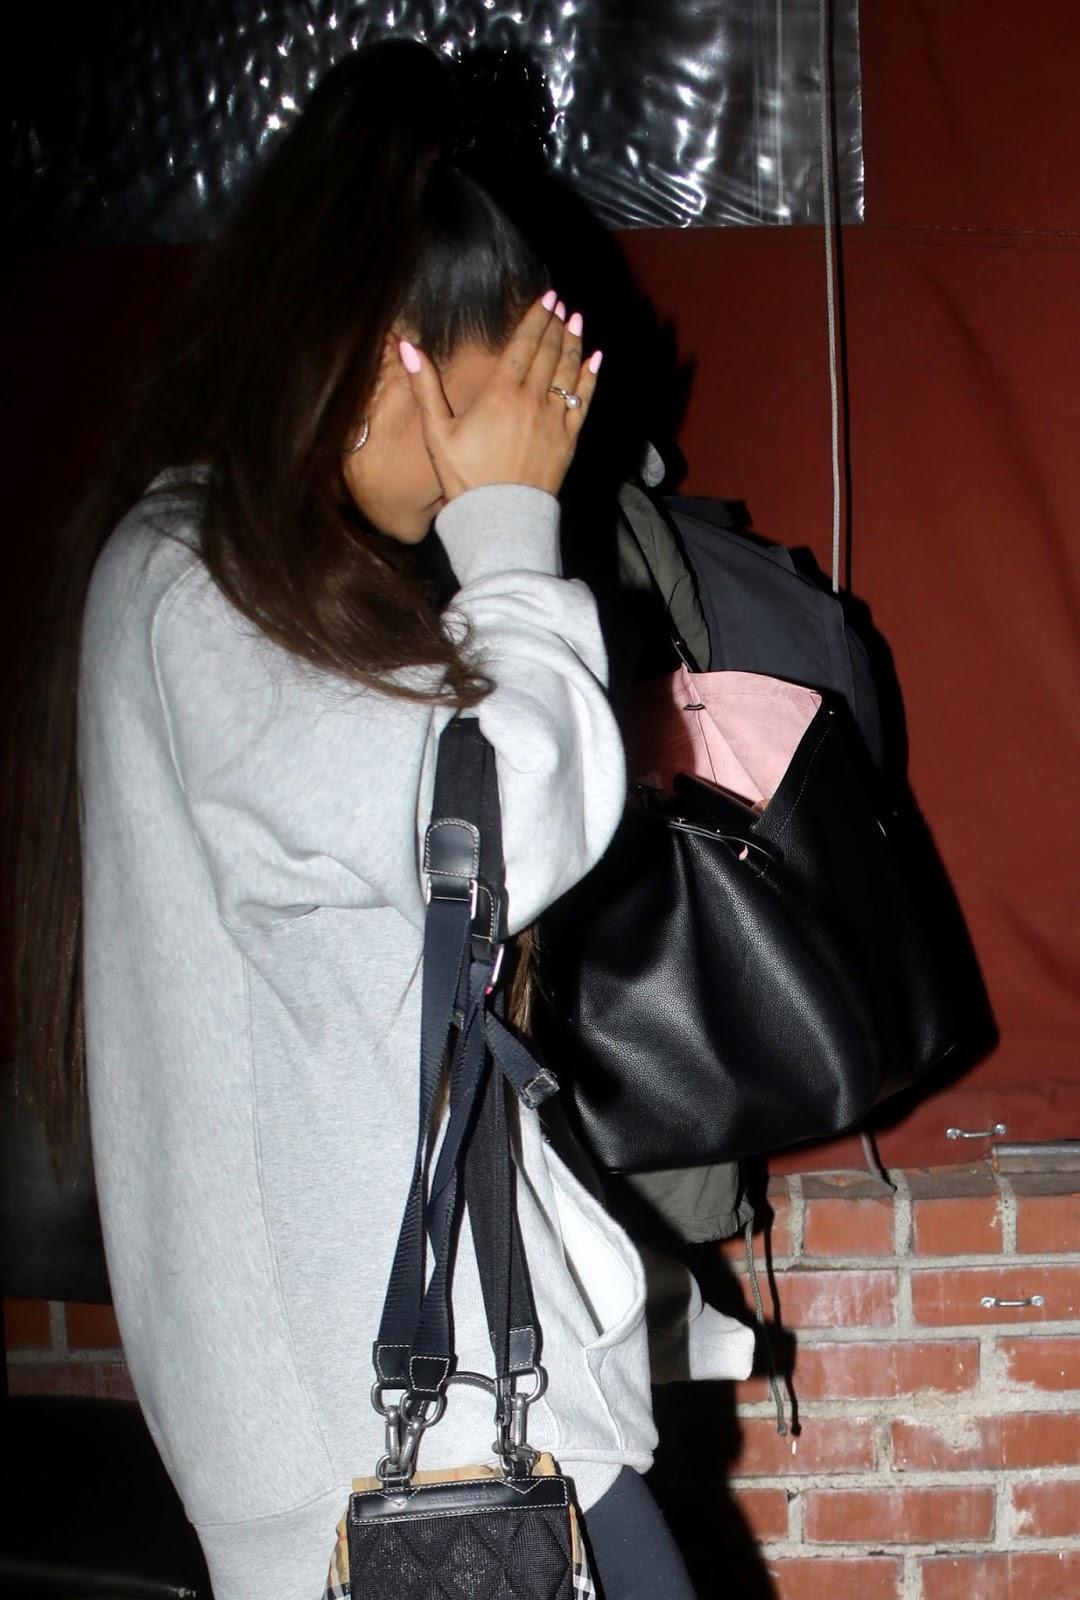 Ariana Grande leaving Pace Restaurant in LA - 02/08/2019